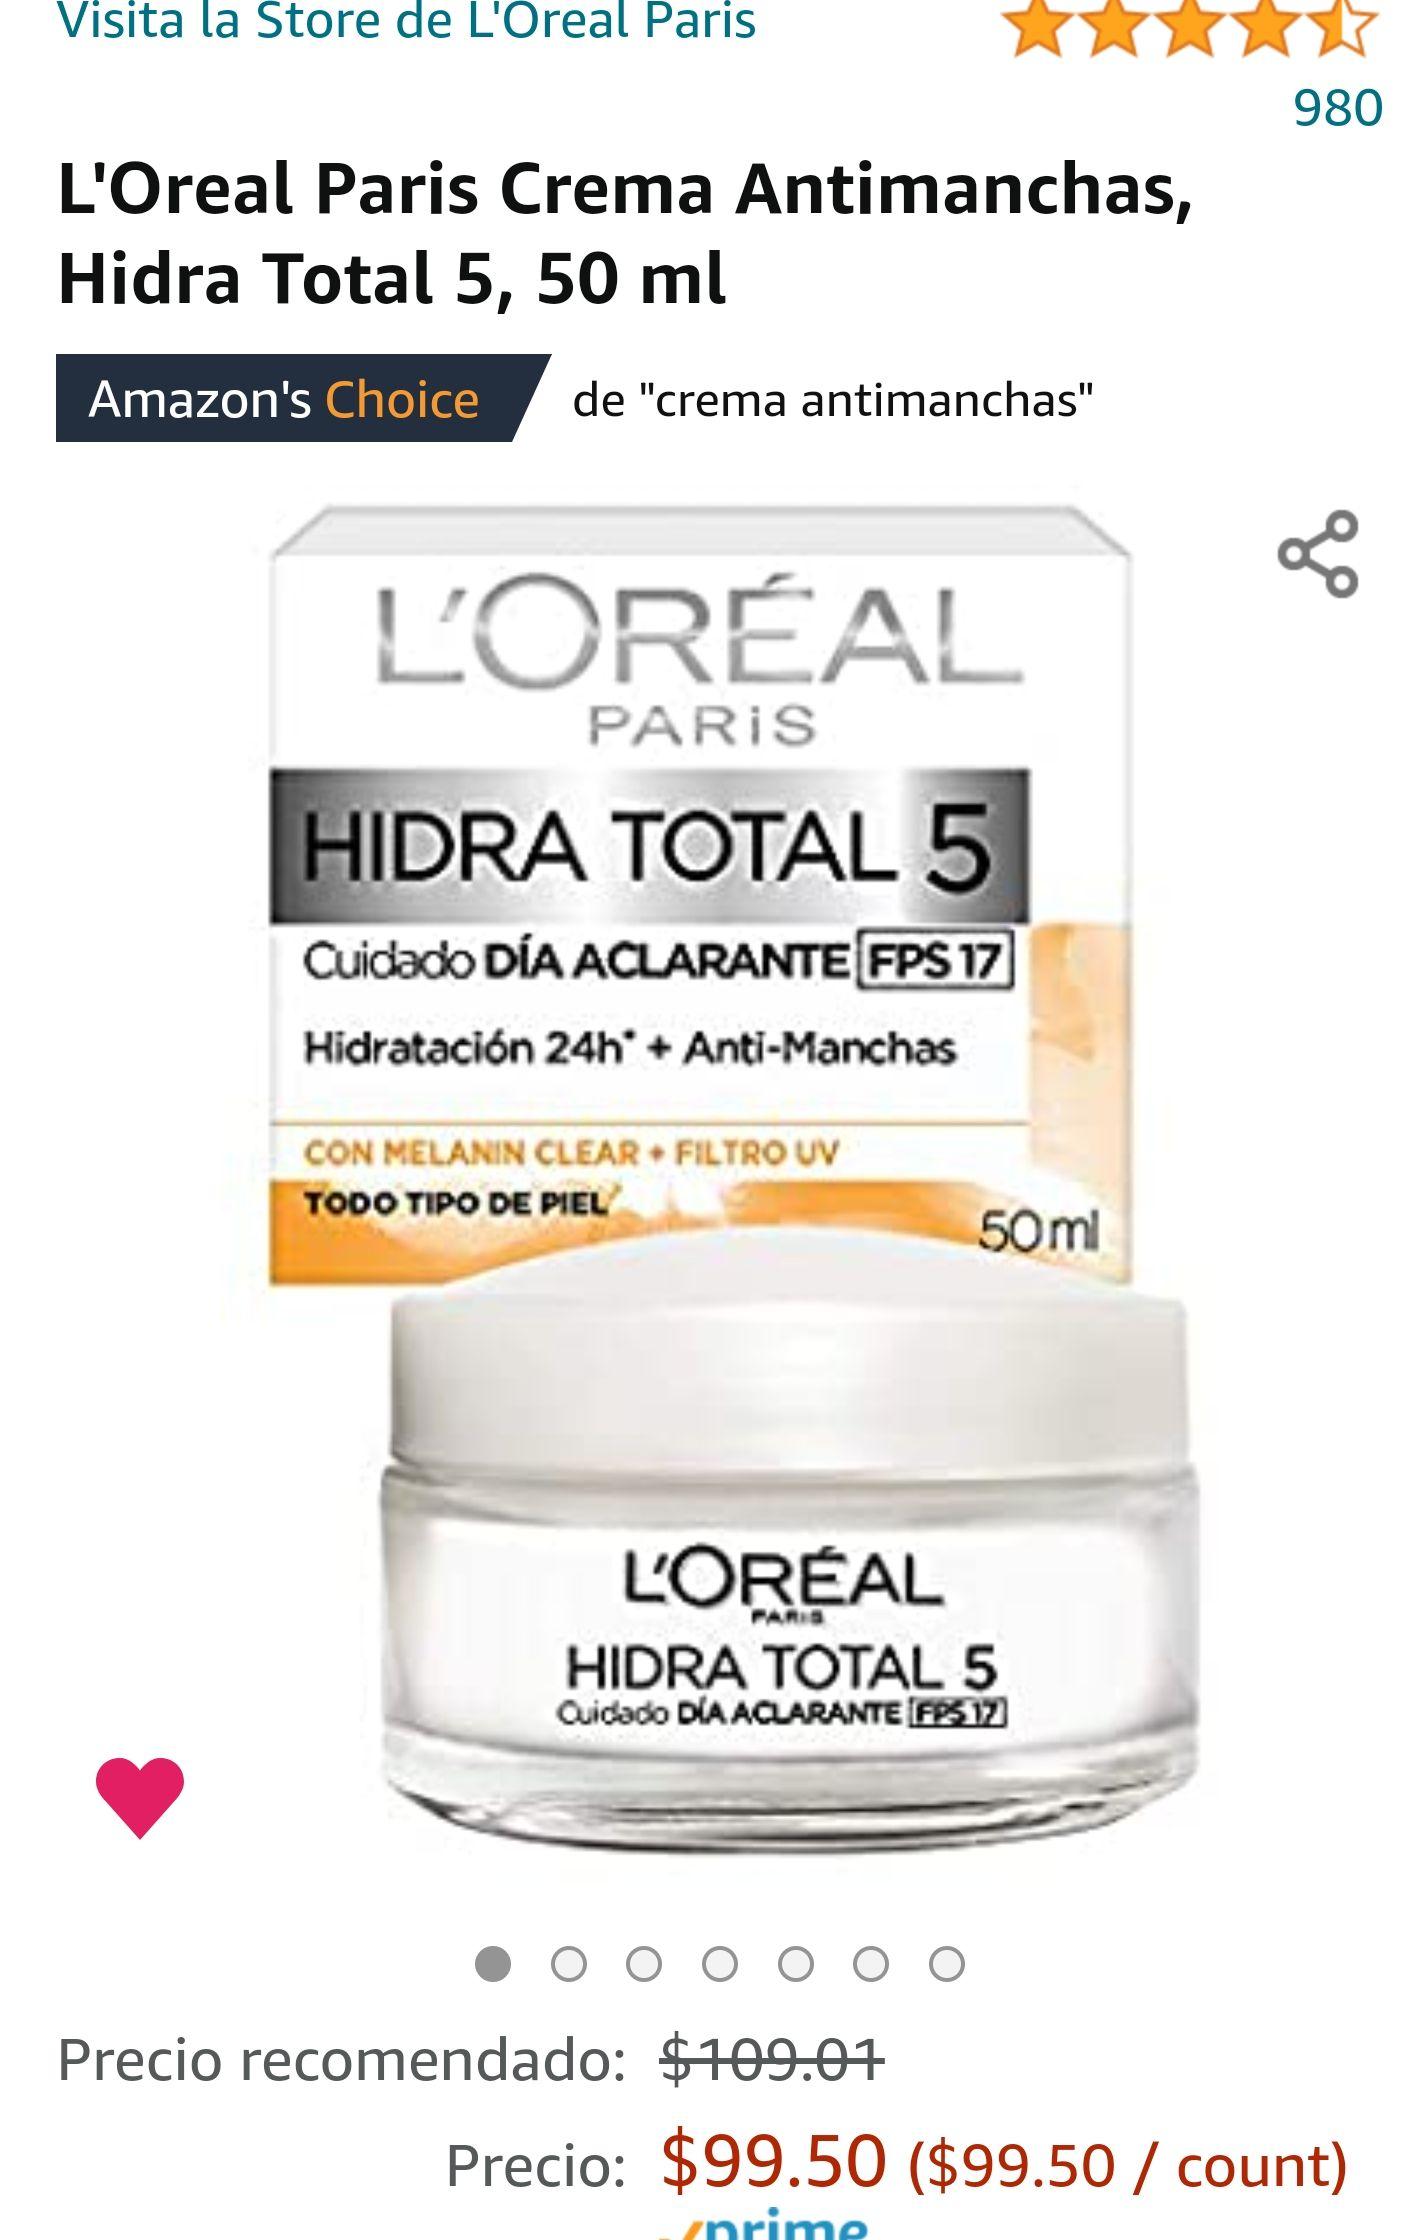 Amazon: L'Oreal Paris Crema Antimanchas, Hidra Total 5